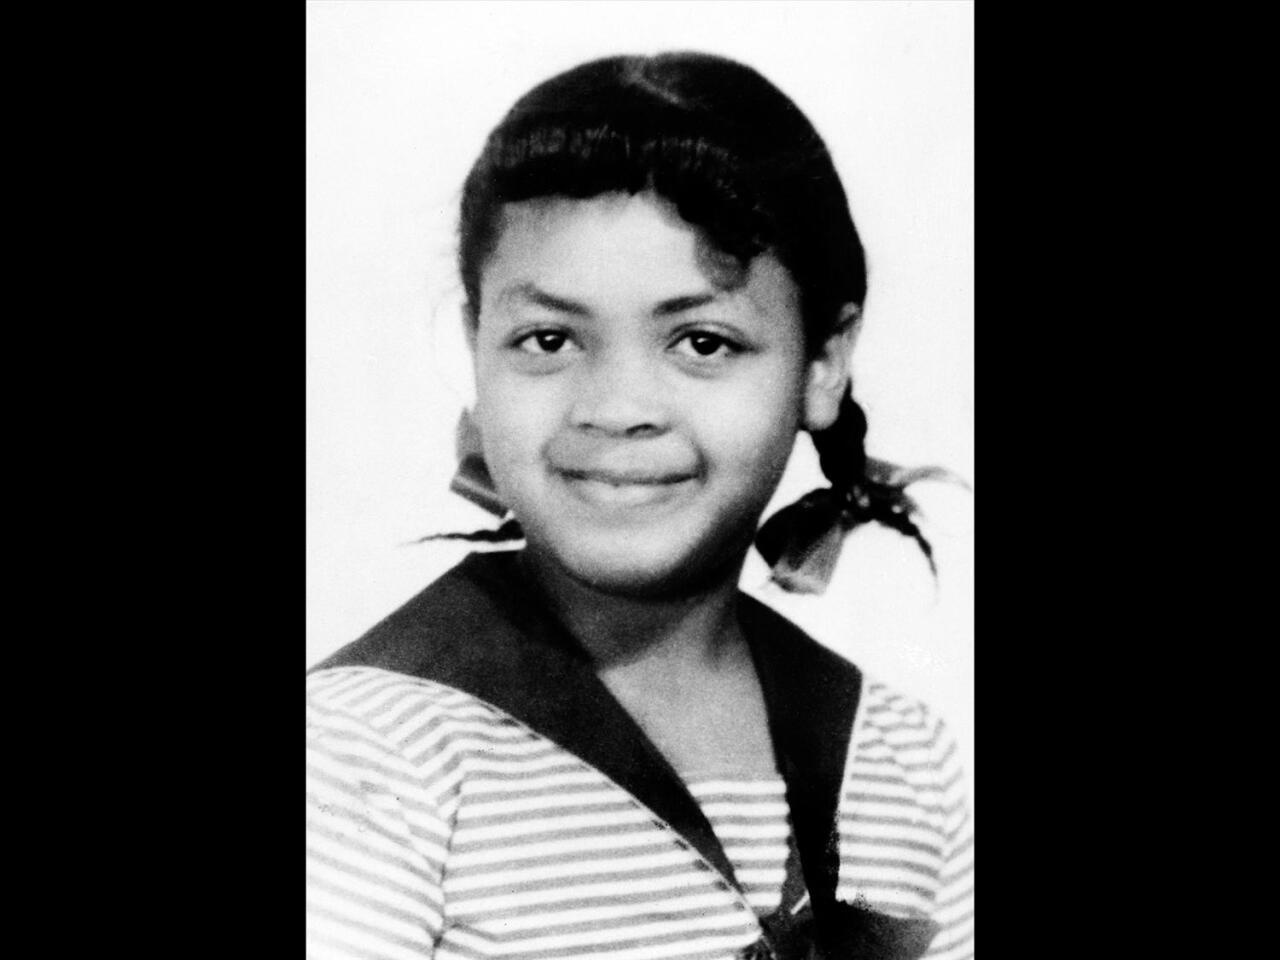 Linda Brown headshot, plaintiff in US Supreme Court Brown v. Board of Education of Topeka, Kansas case, B&W photo on black